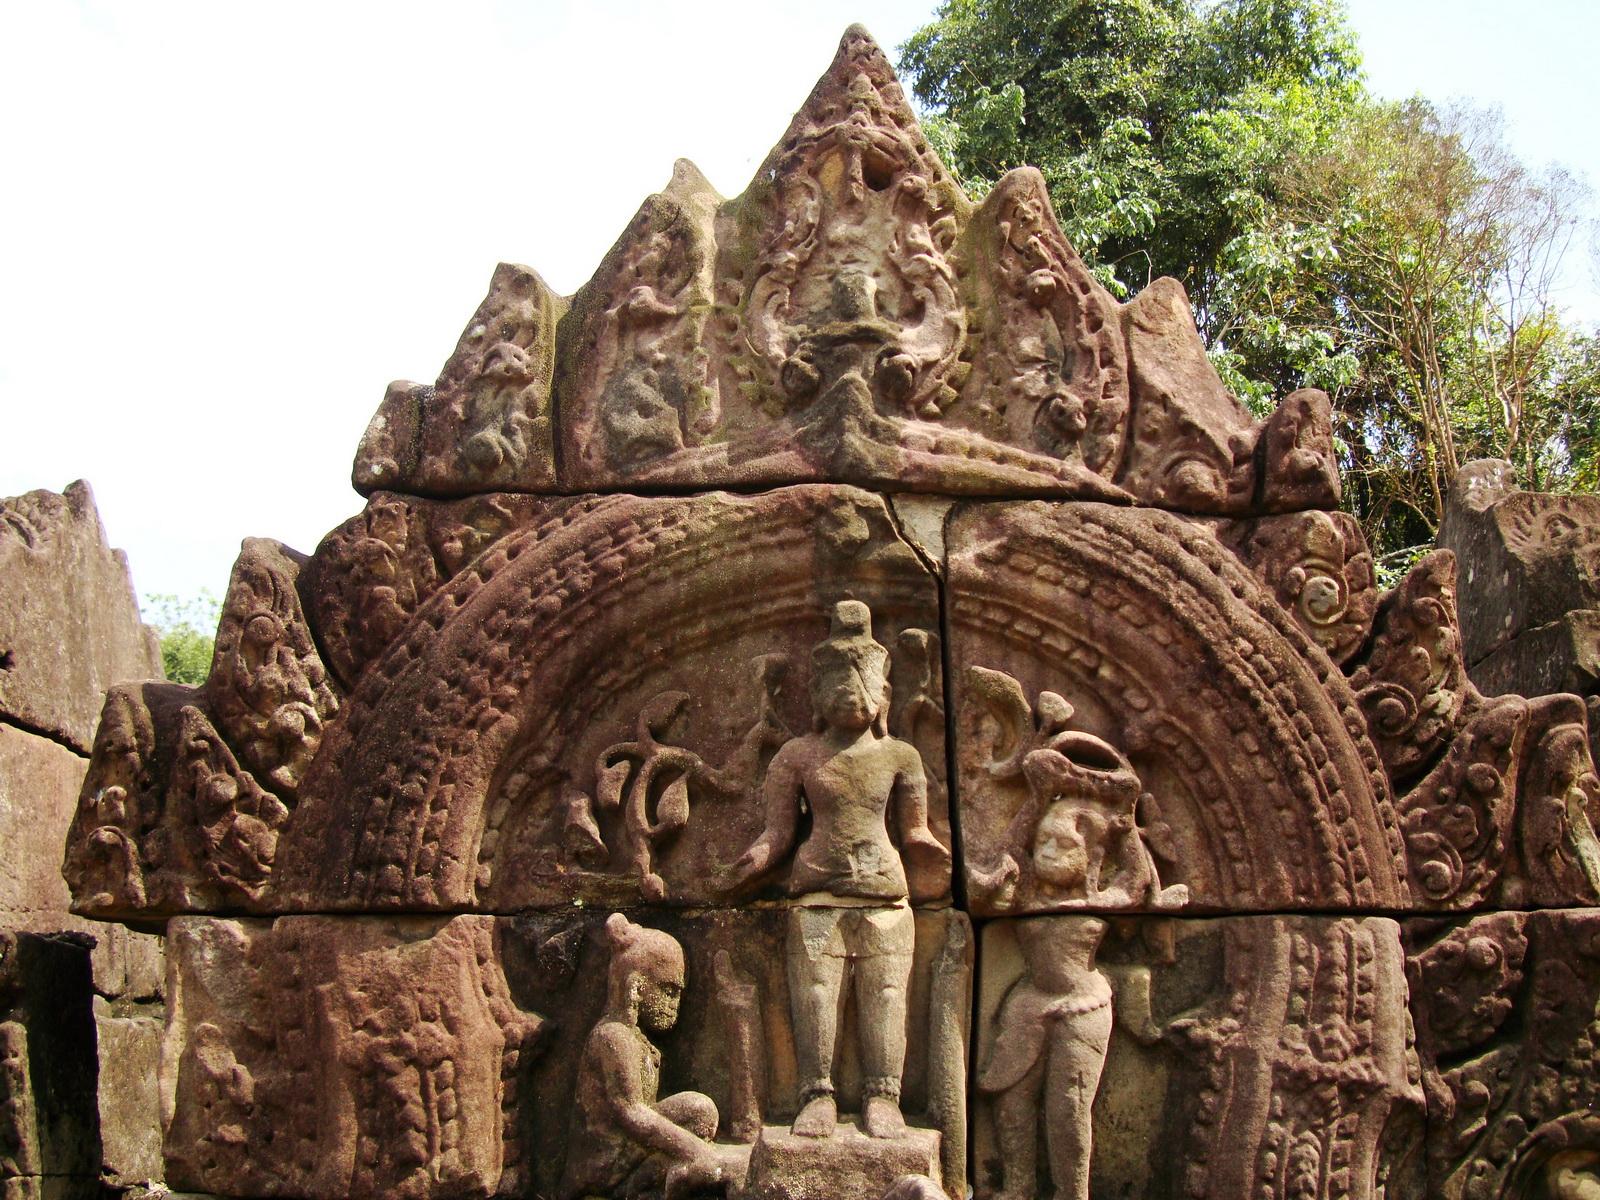 Neak Pean Temple Bas reliefs Jan 2010 02